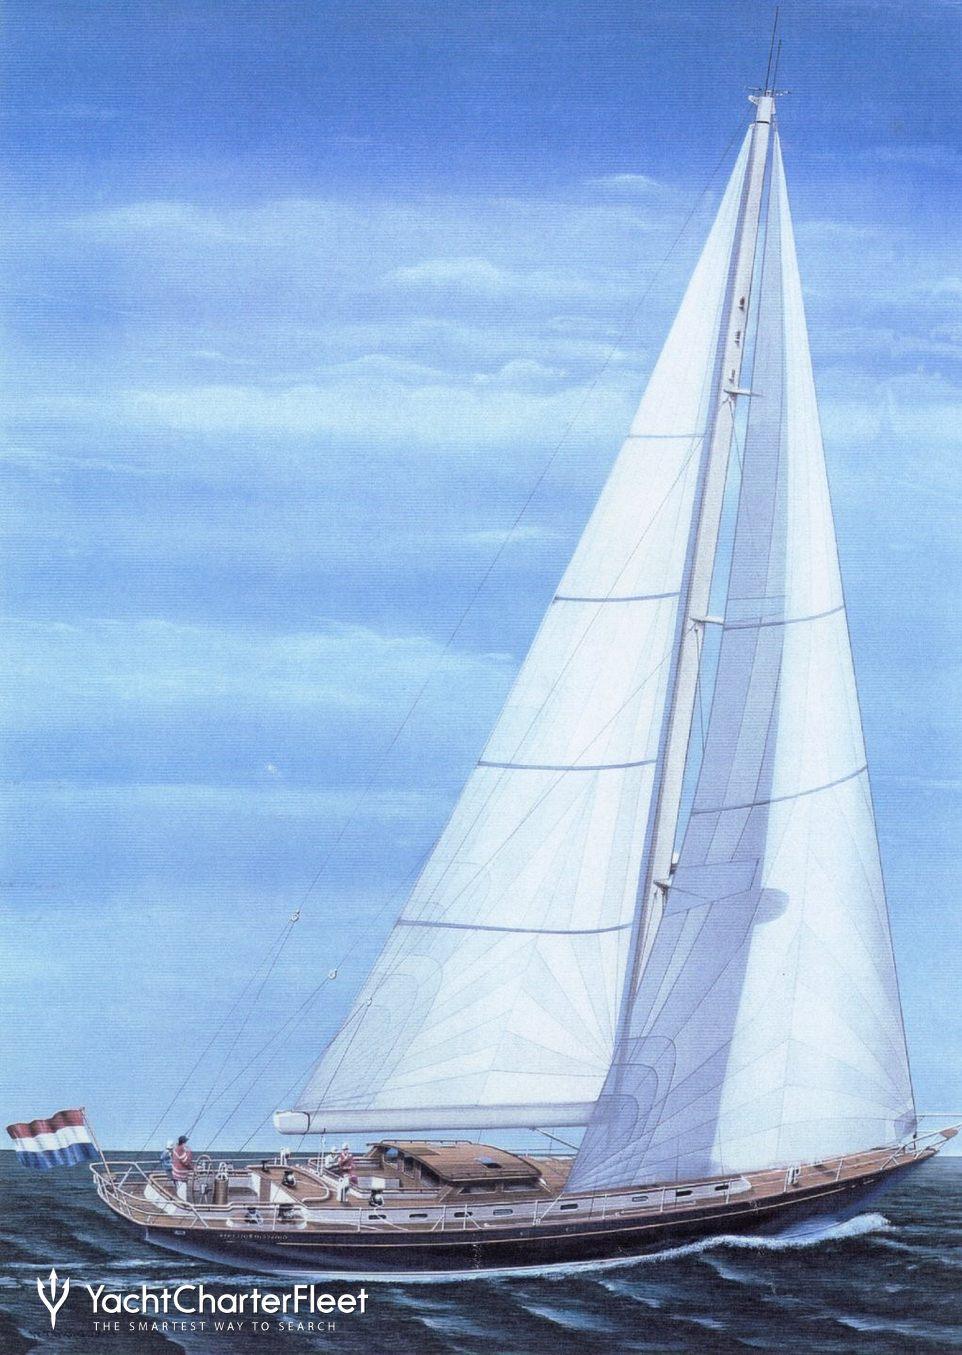 Ghaccio Bollente Charter Yacht